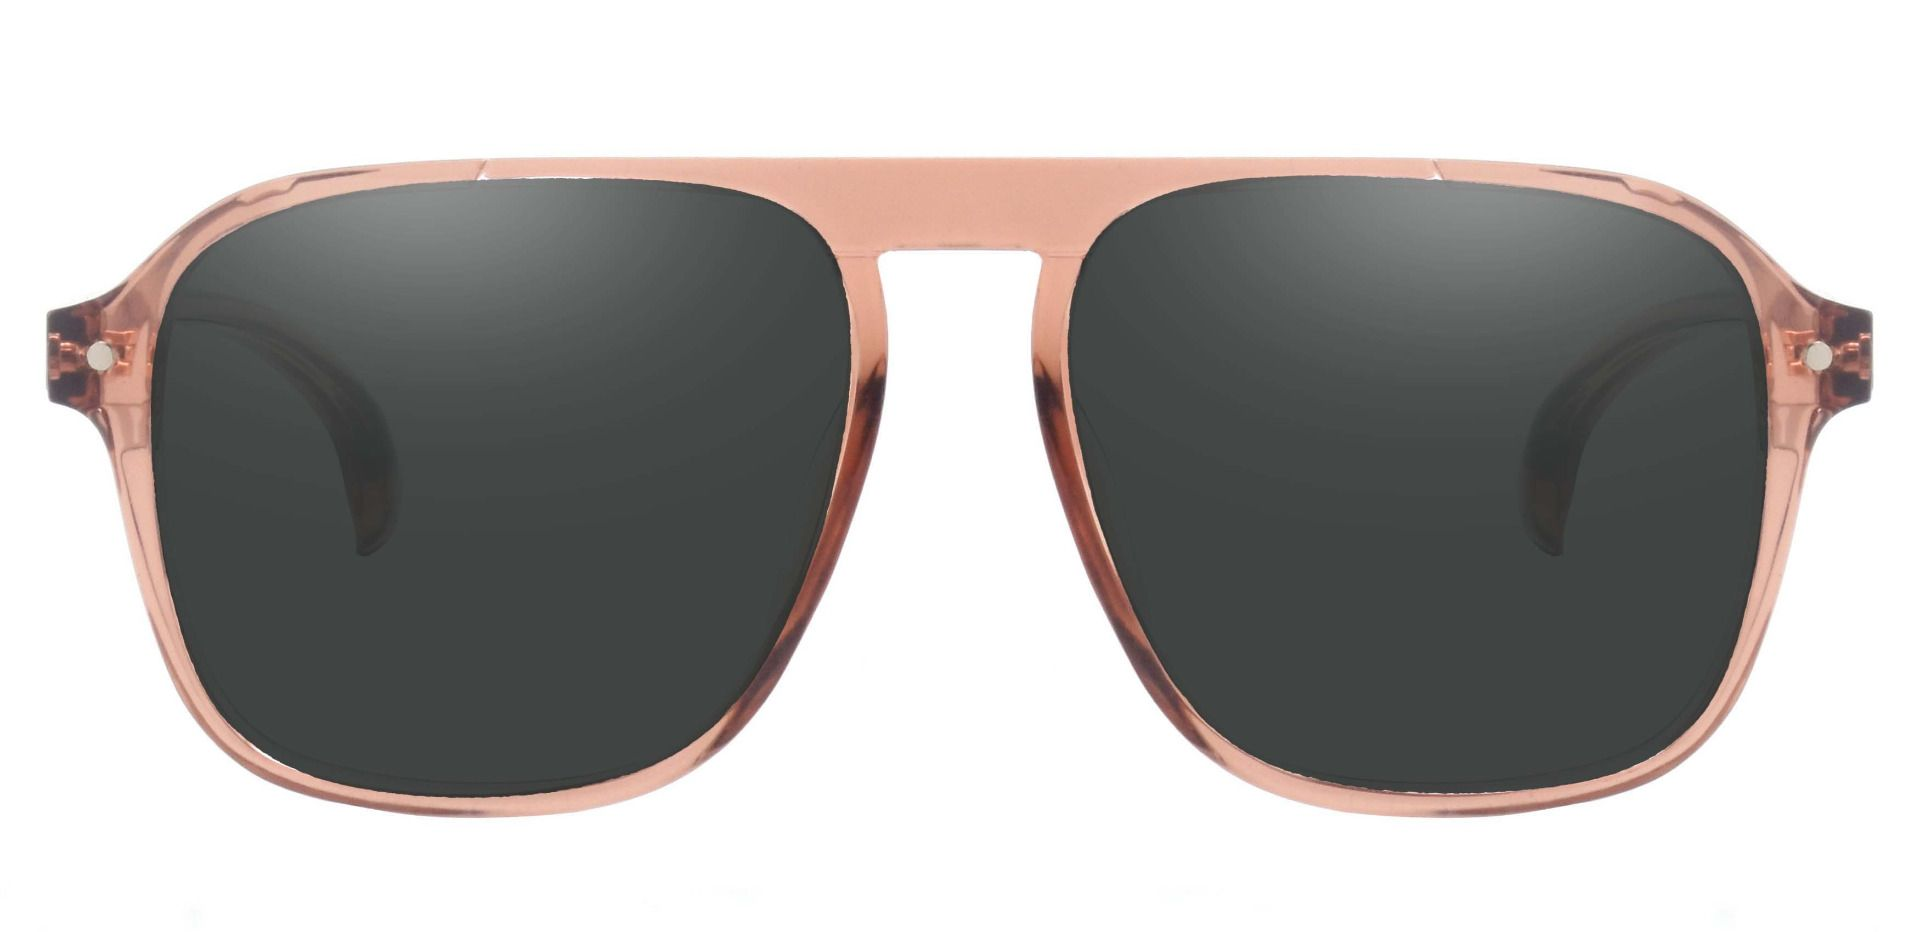 Gideon Aviator Prescription Sunglasses - Brown Frame With Gray Lenses